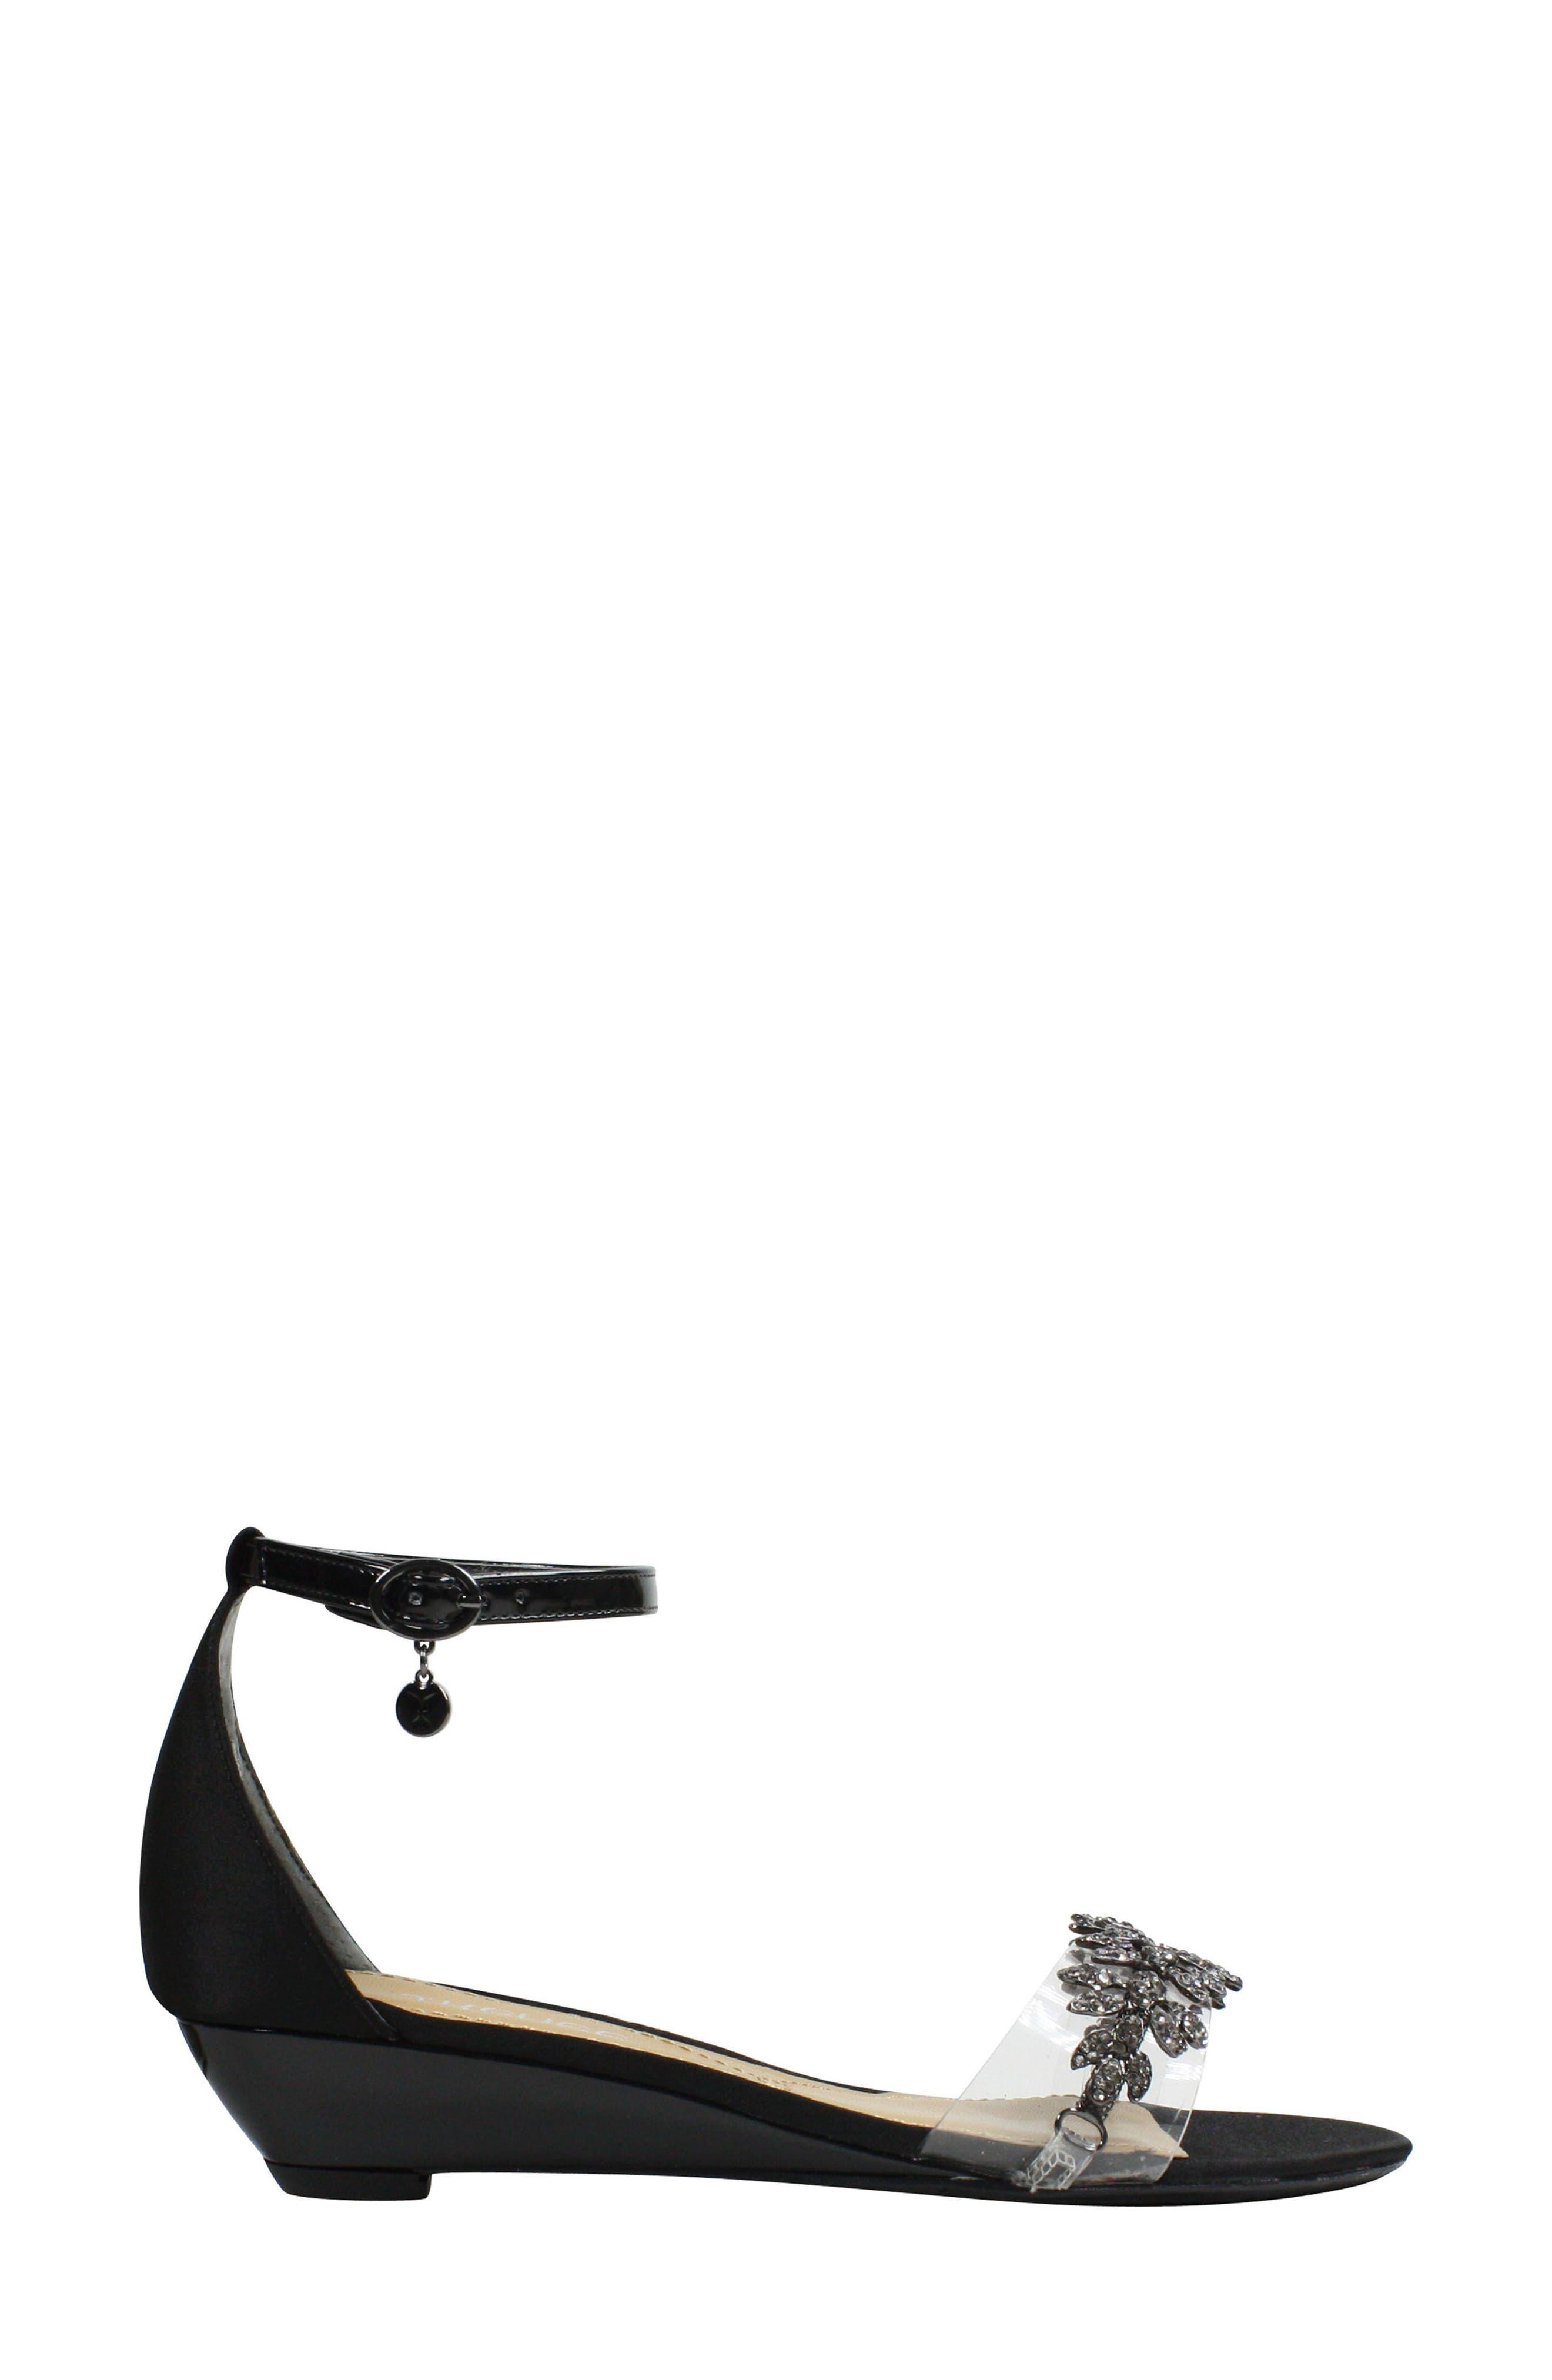 Evania Ankle Strap Sandal,                             Alternate thumbnail 3, color,                             BLACK SATIN